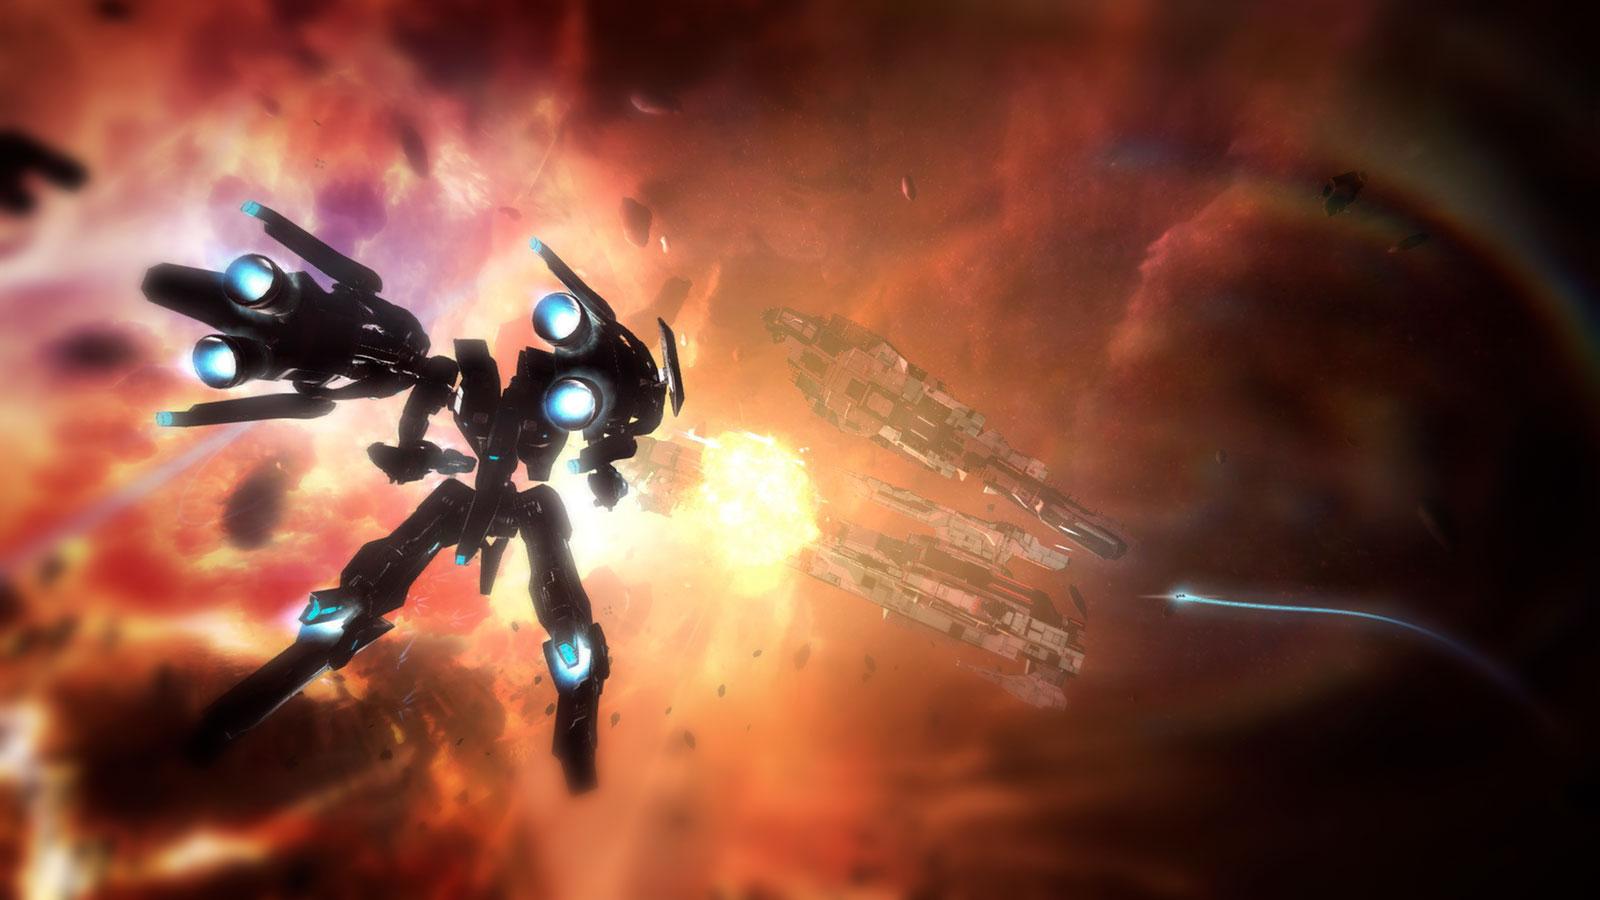 Strike Suit Zero меха в космосе